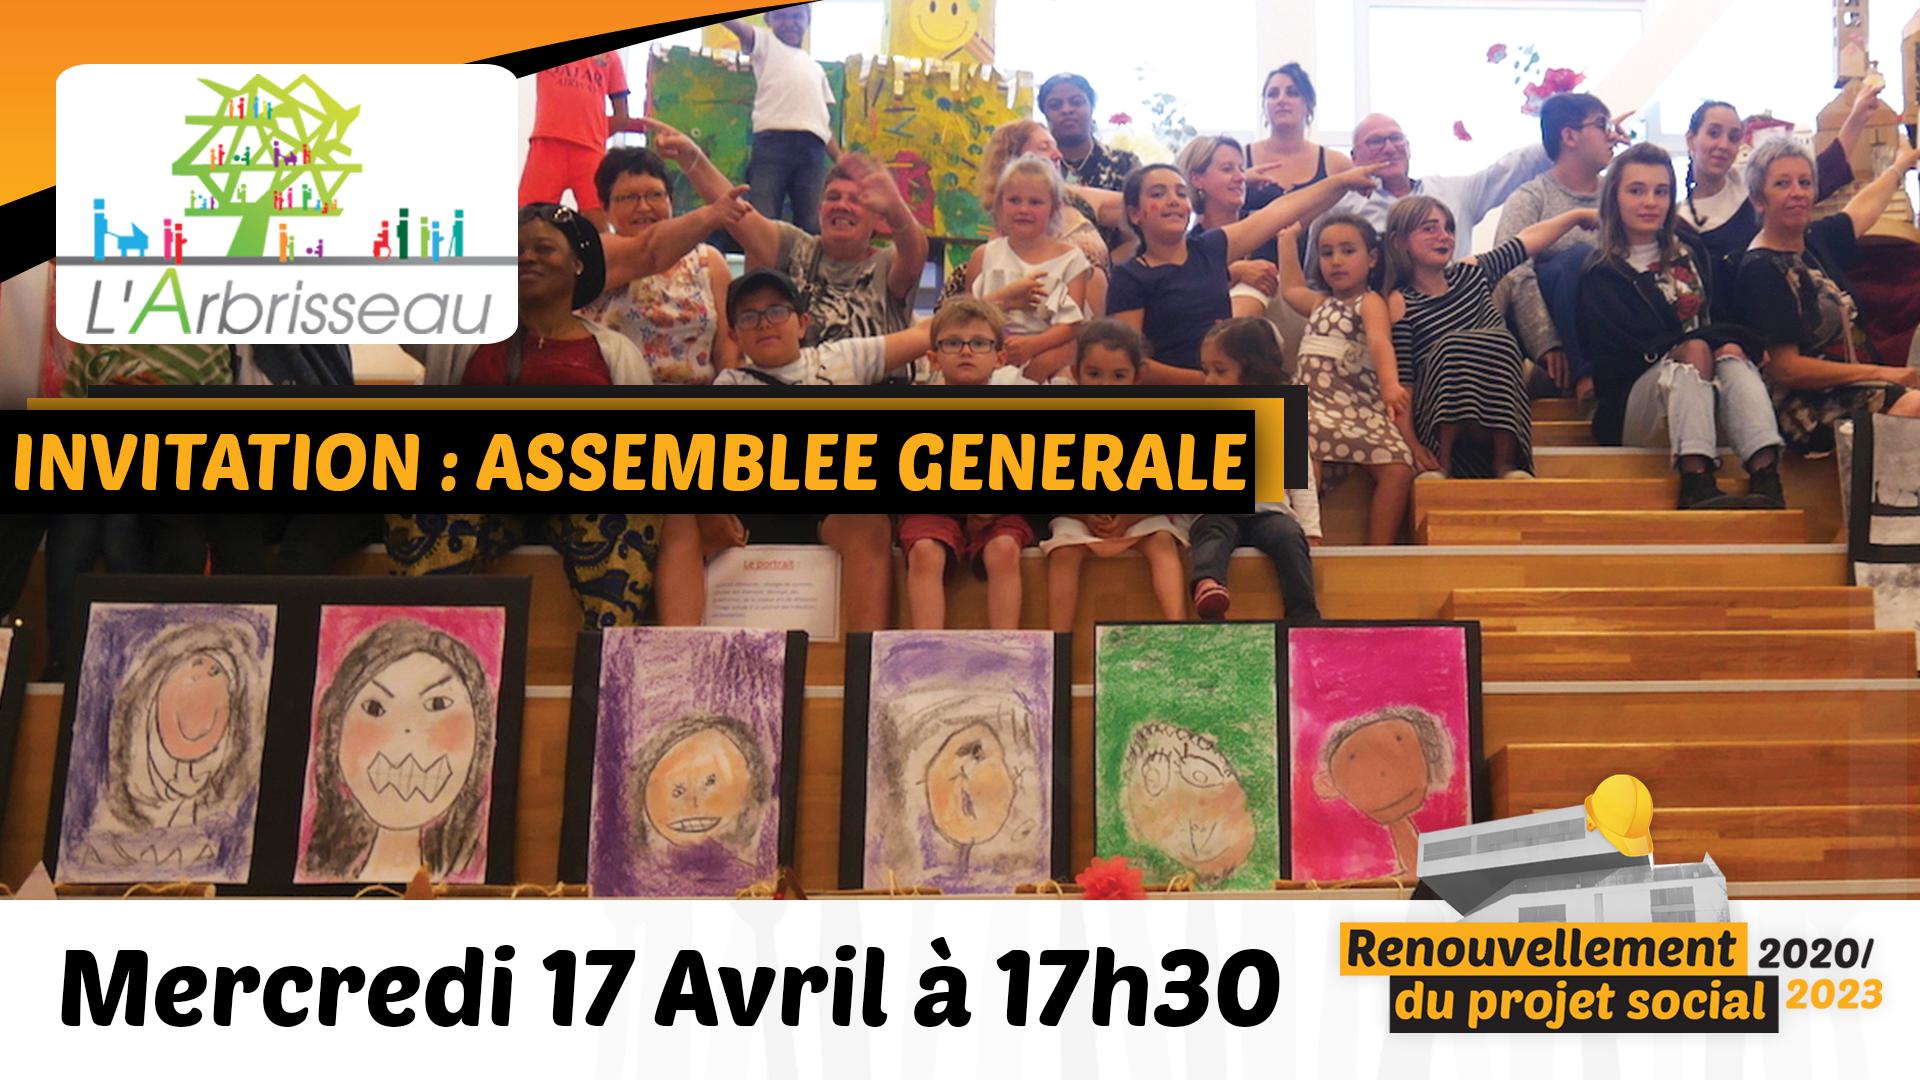 Assemblée Générale mercredi 17 Avril